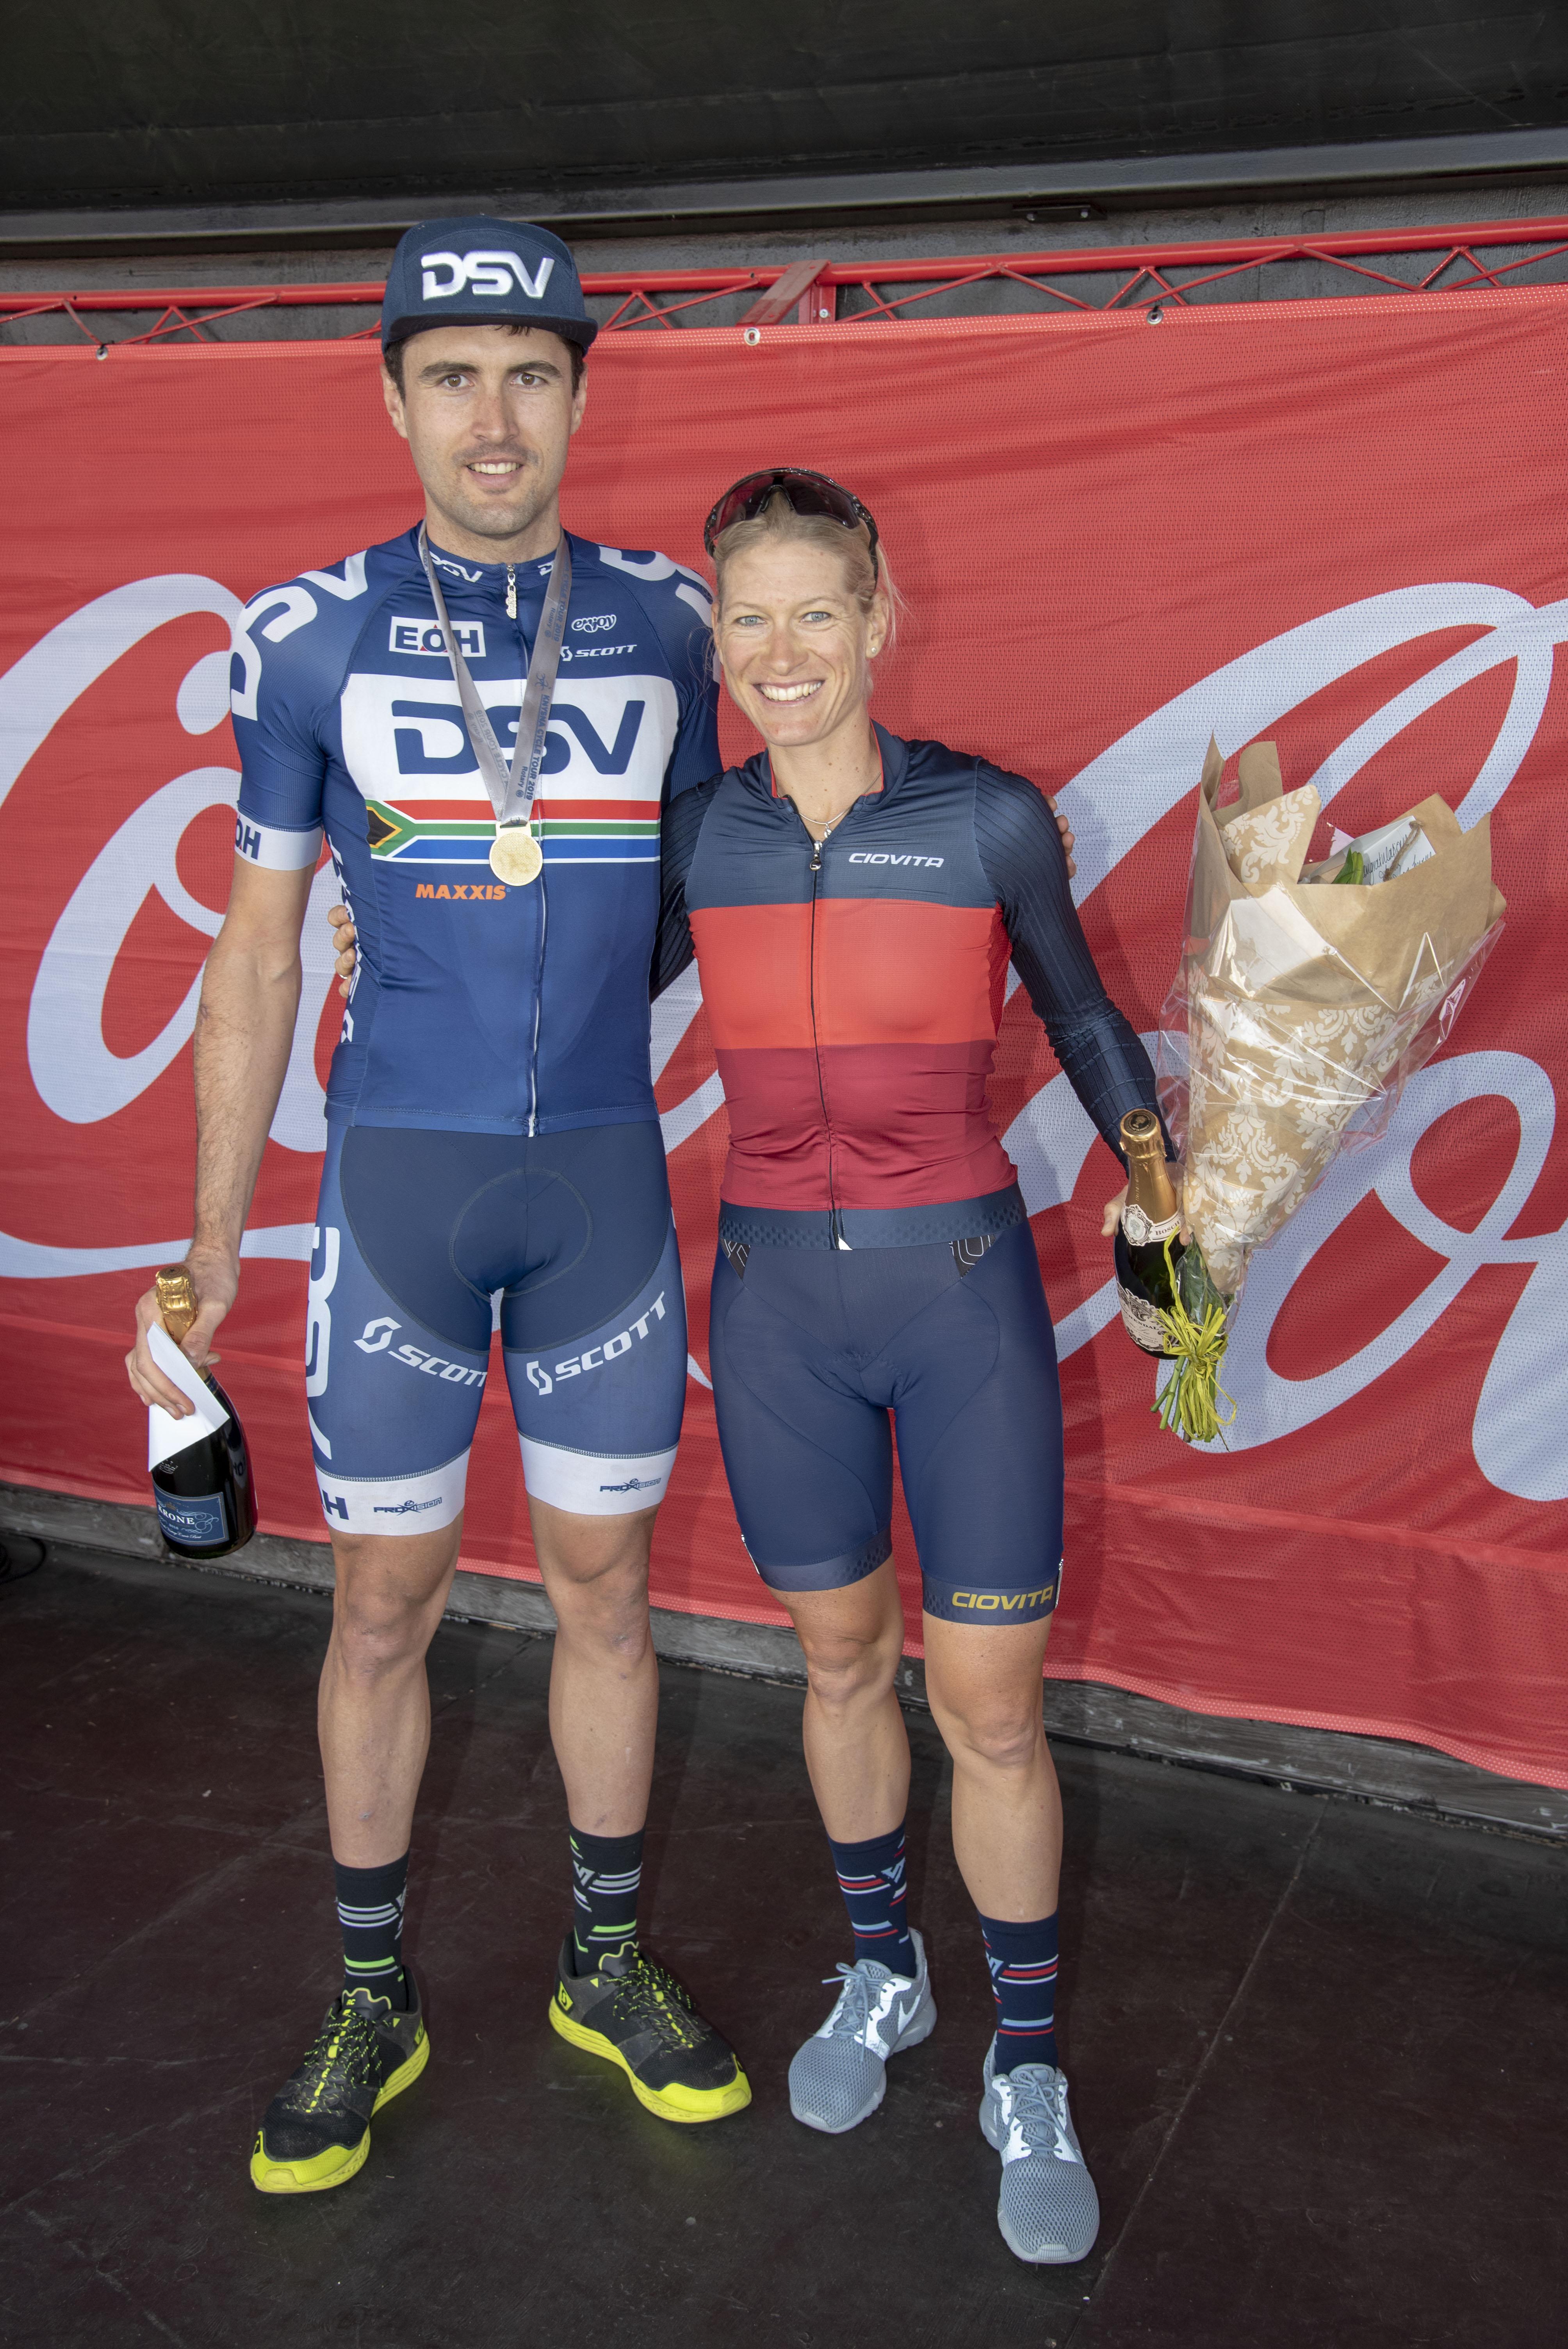 Winners 80 km MTB Gert Heyns and Robyn de Groot high res